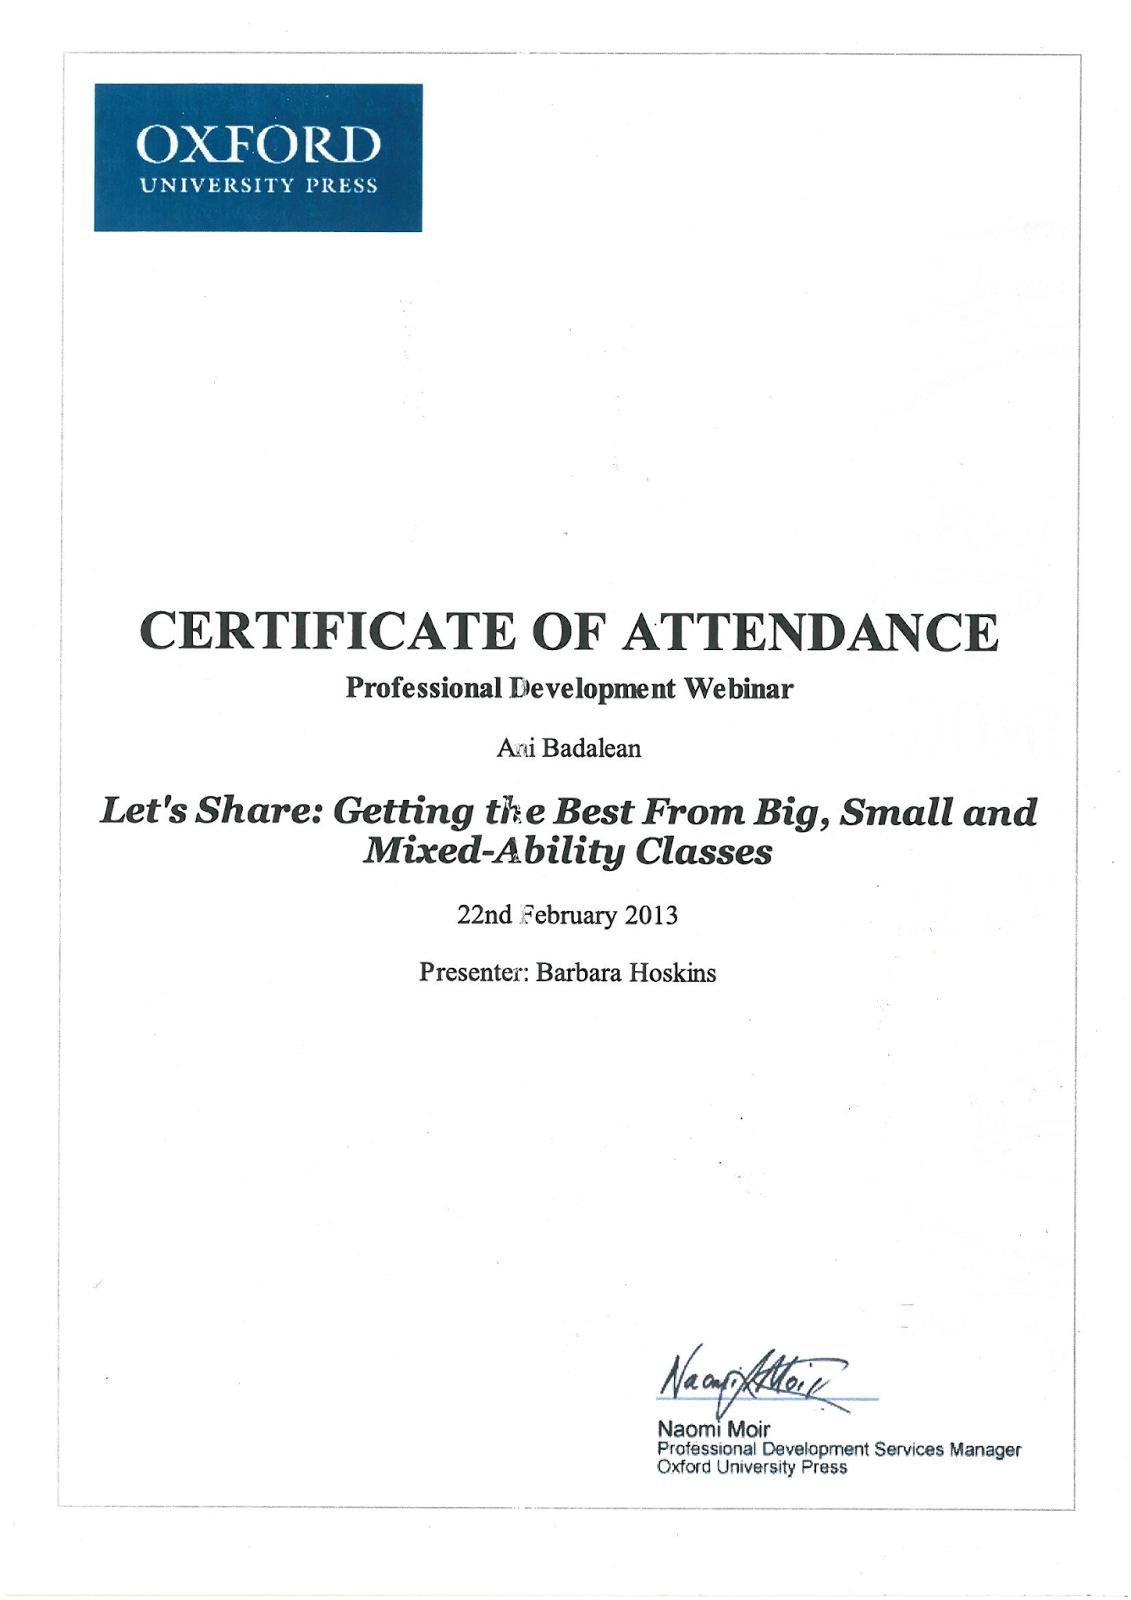 Lingua franca ani badalean international certification 1betcityfo Images